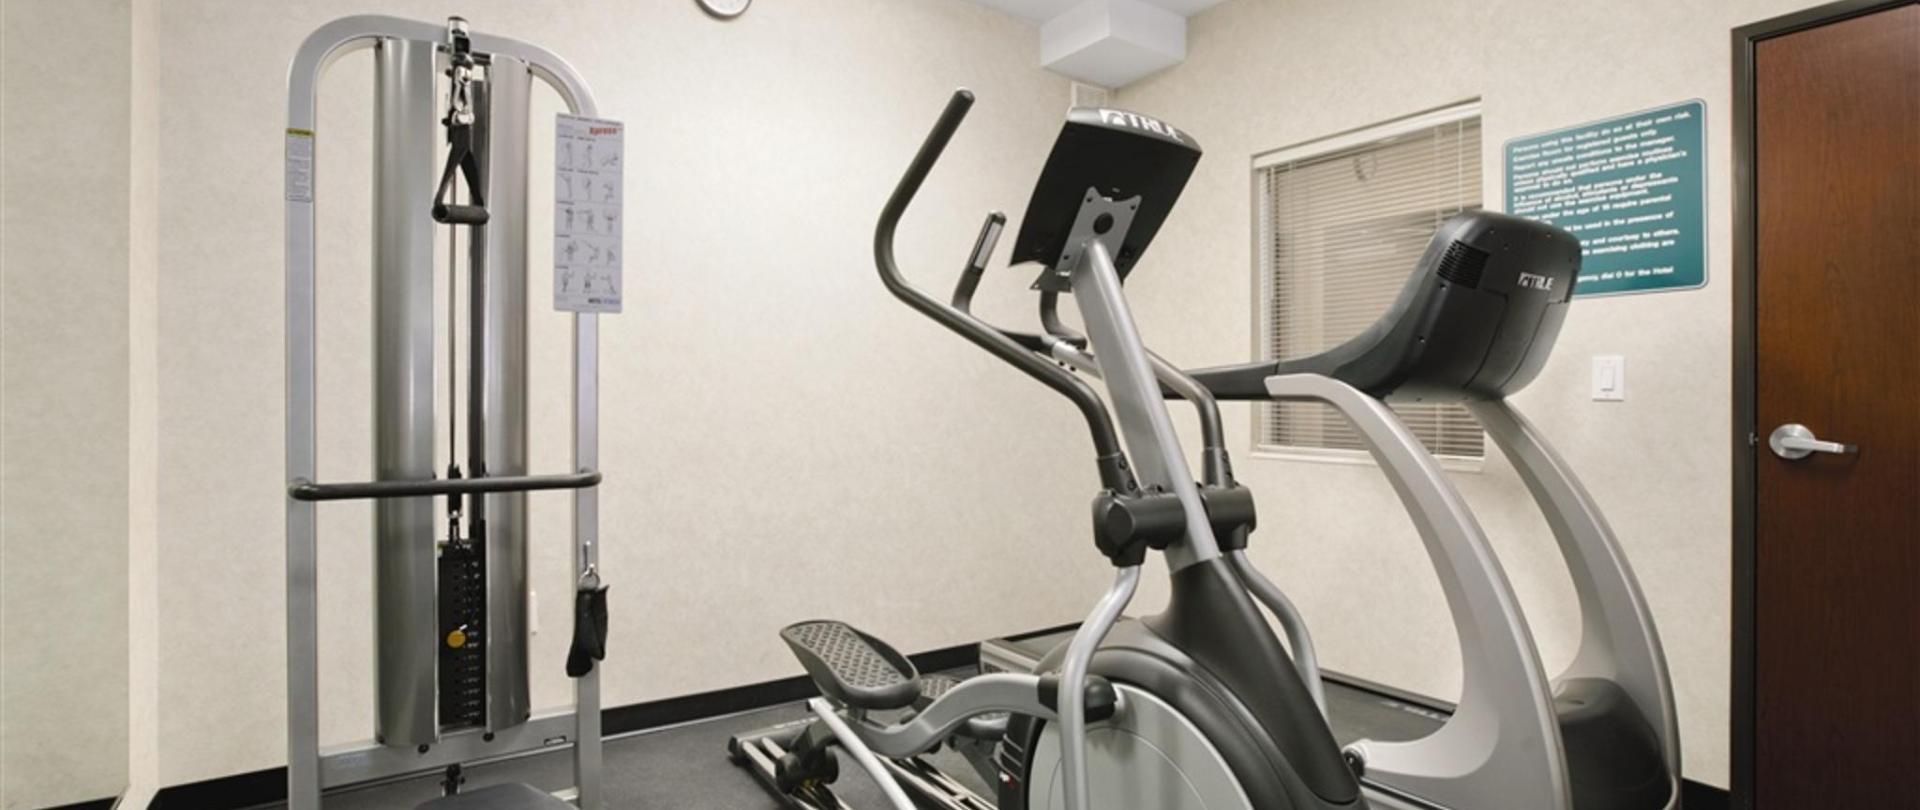 fitness-or168.jpg.1024x0.jpg